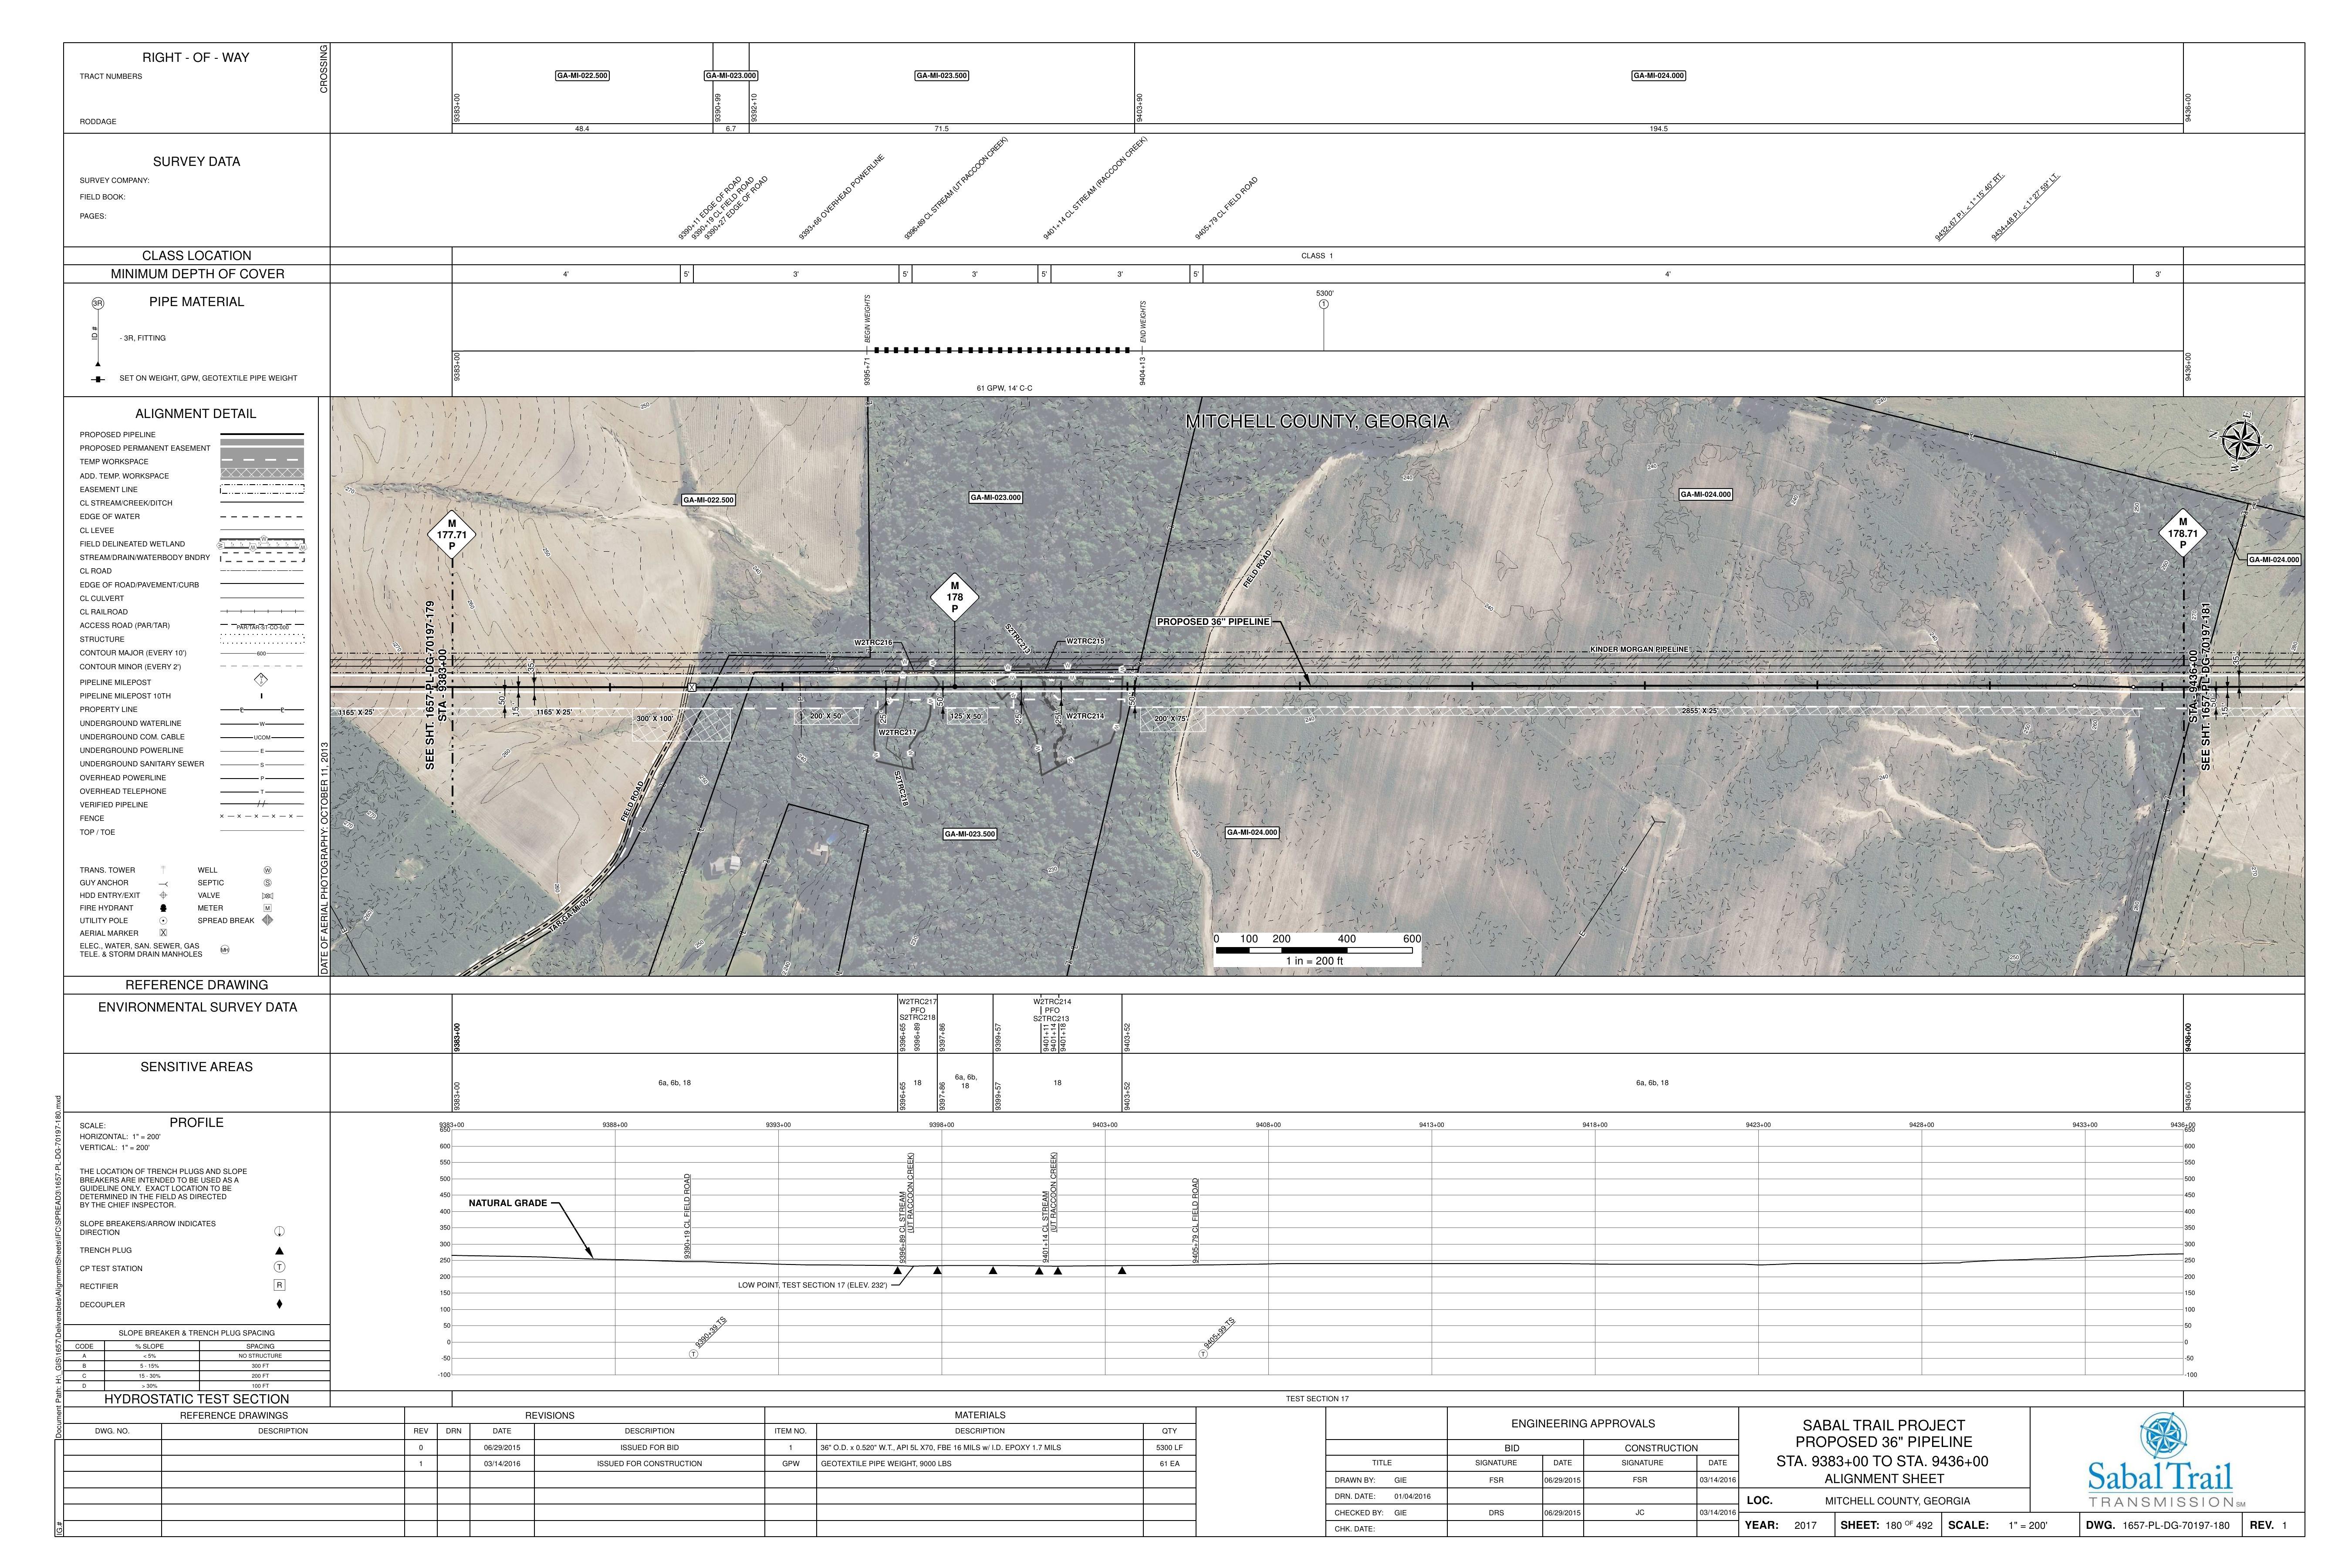 5400x3601 UT & CL Raccoon Creek & 12220 HWY 93, BACONTON, GA 31716, STA. 9383+00 TO STA. 9436+00, 31.351624, -84.022632, in Mitchell County, GA, by Sabal Trail Transmission, 2016-04-07